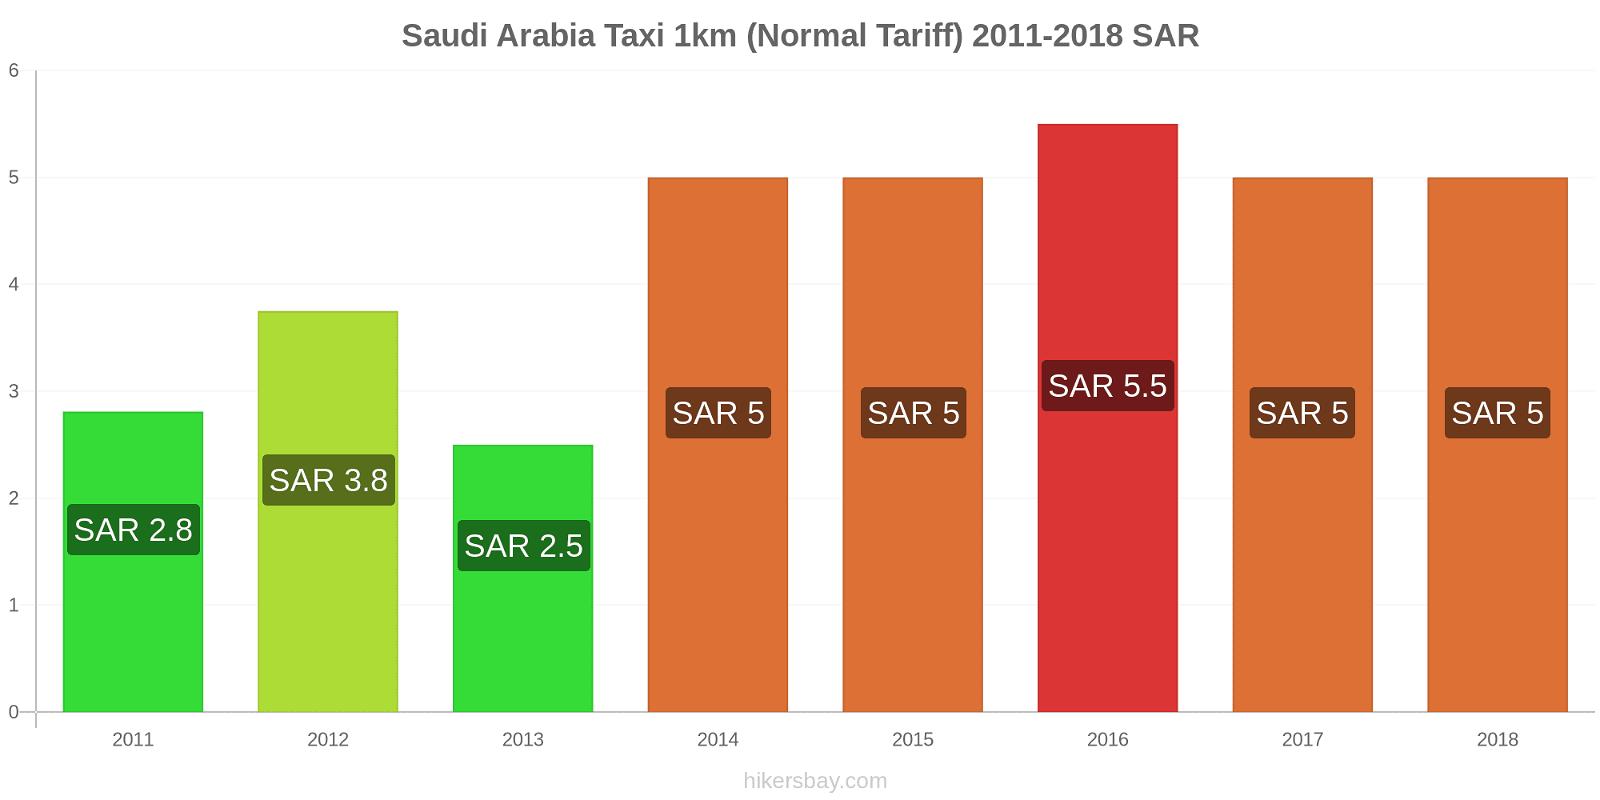 Saudi Arabia price changes Taxi 1km (Normal Tariff) hikersbay.com